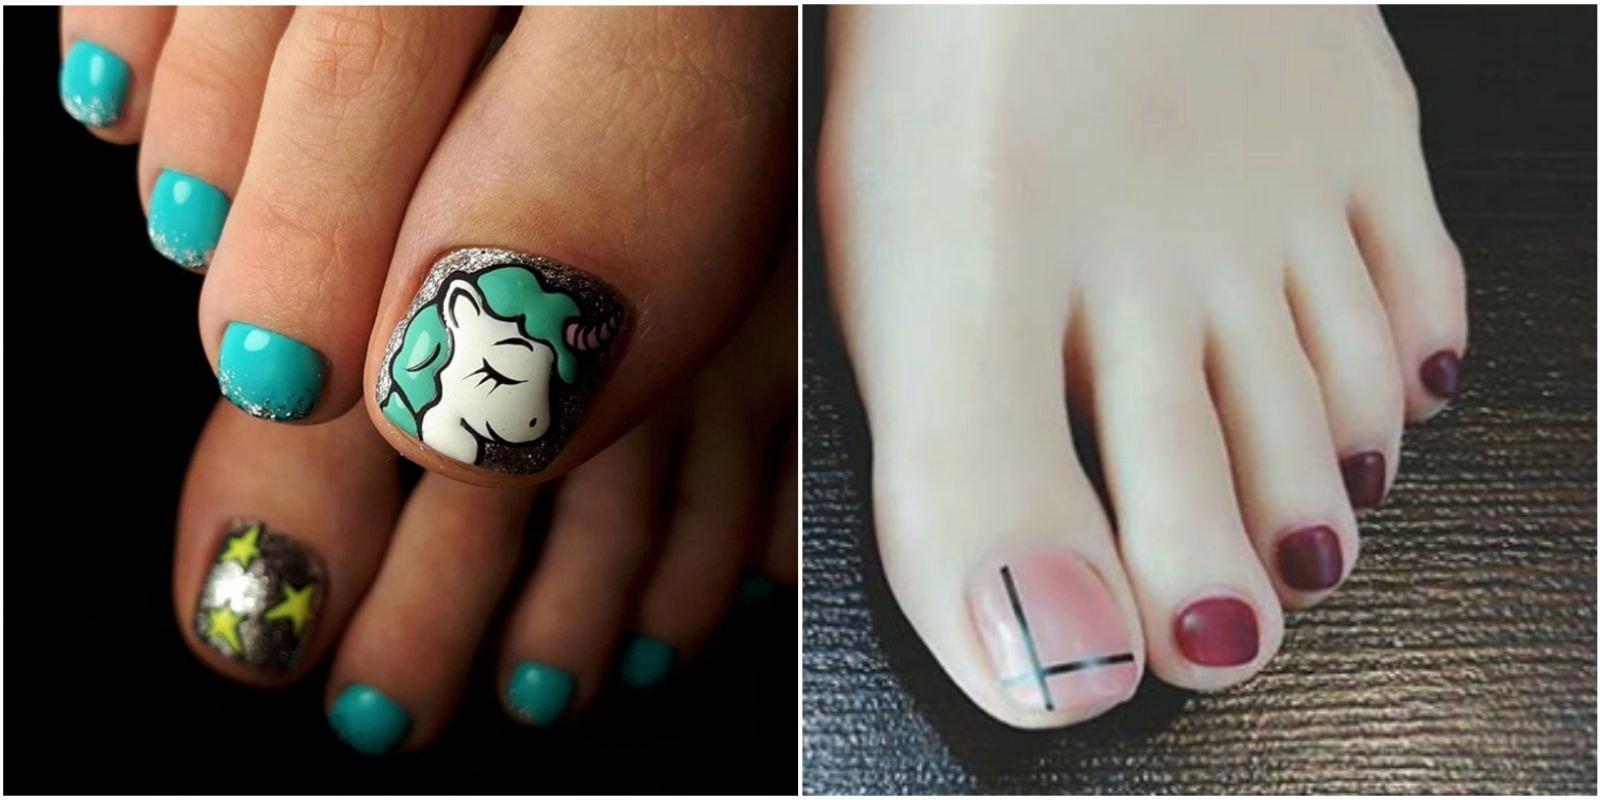 Toe Nail Design Pictures Inspirational 12 Cute toe Nail Art Designs 2018 Best toenail Polish Ideas